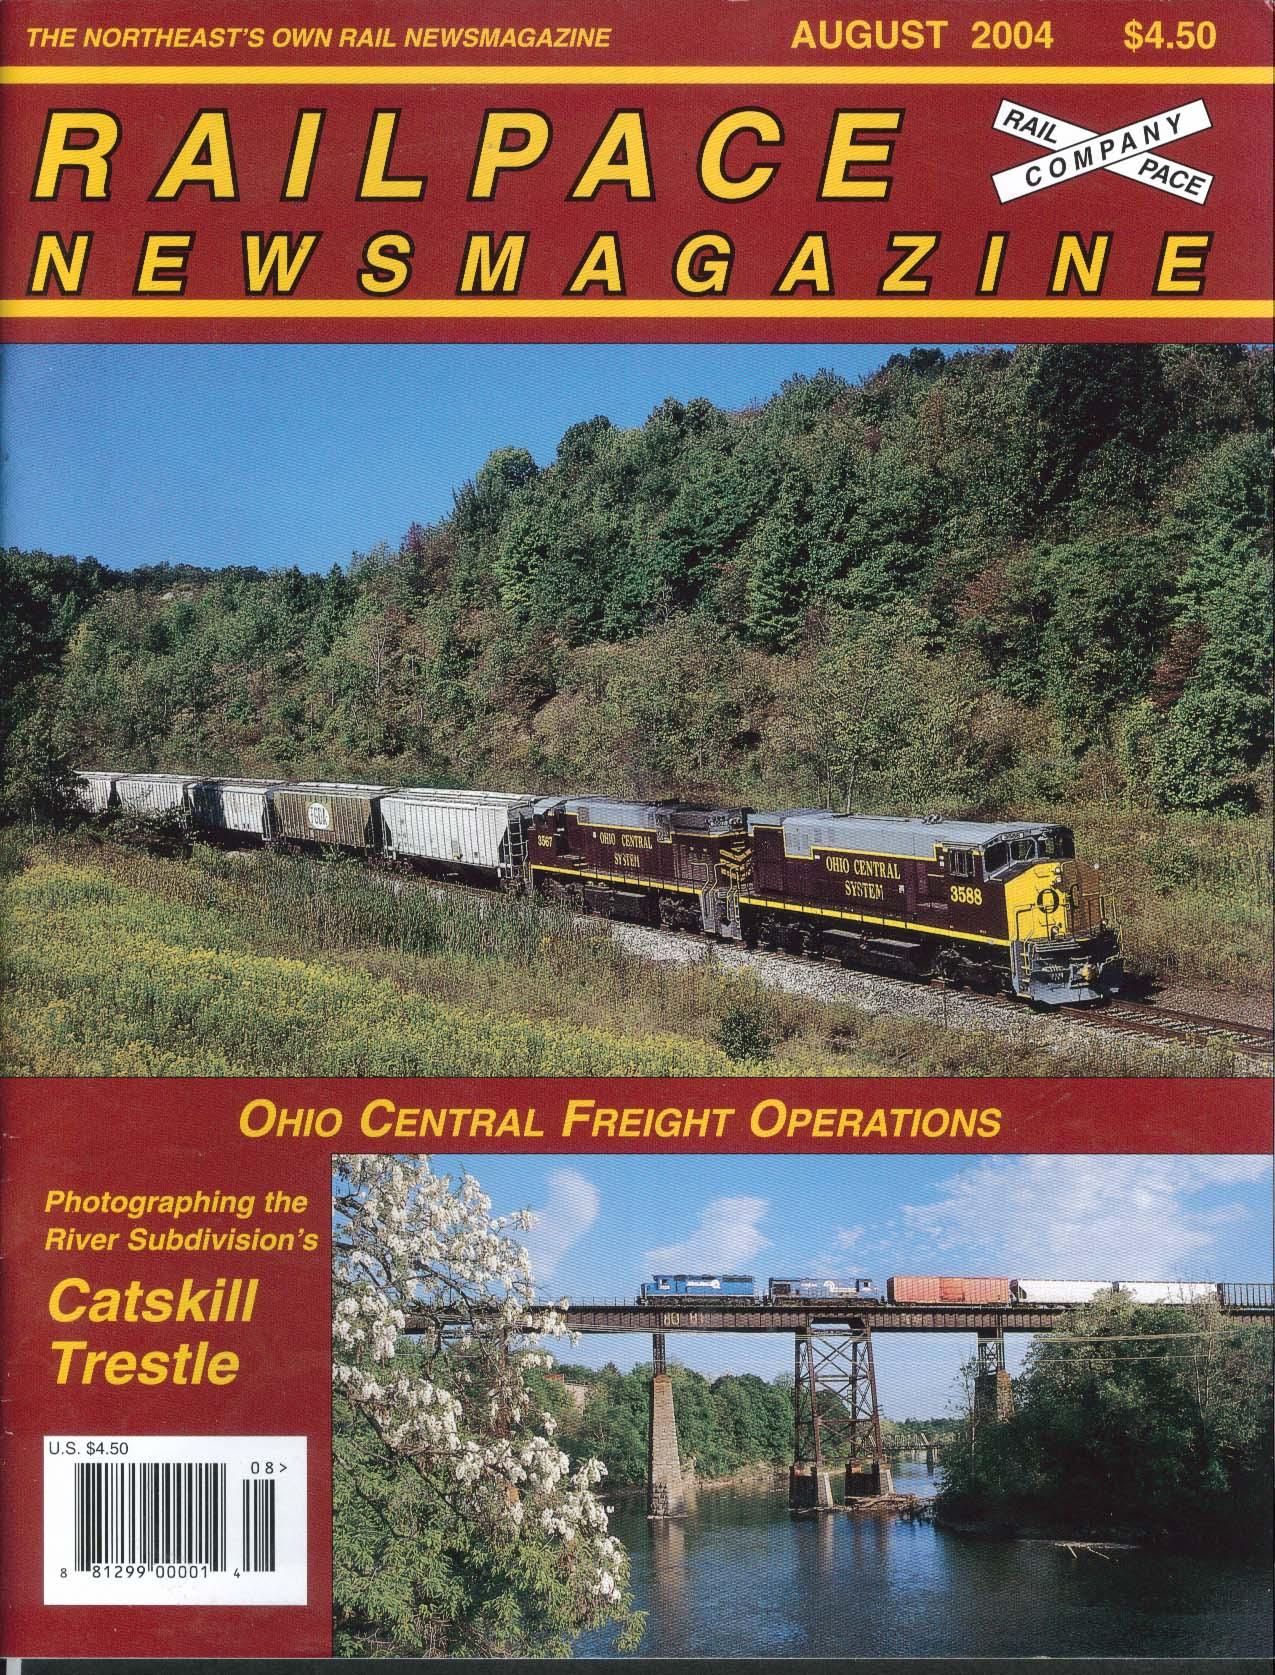 RAILPACE Ohio Central Freight Operations Castkill Trestle Subdivision 8 2004